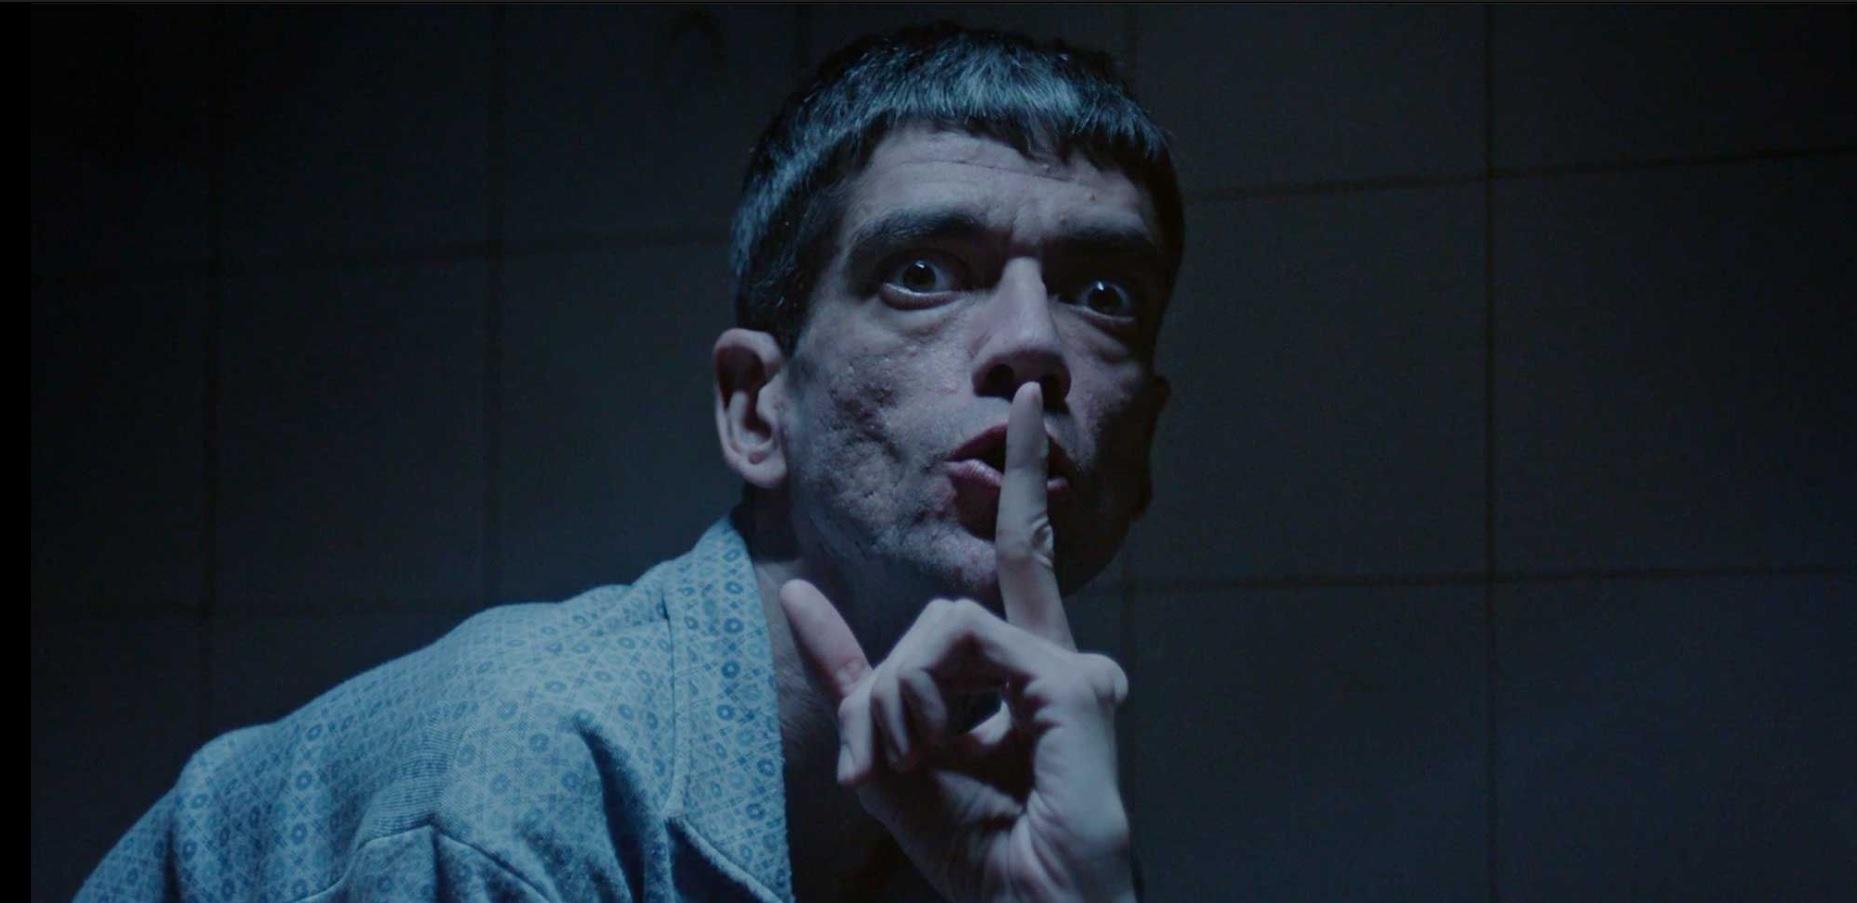 Javier Botet protagoniza 'Amigo'. El Ojo Mecánico